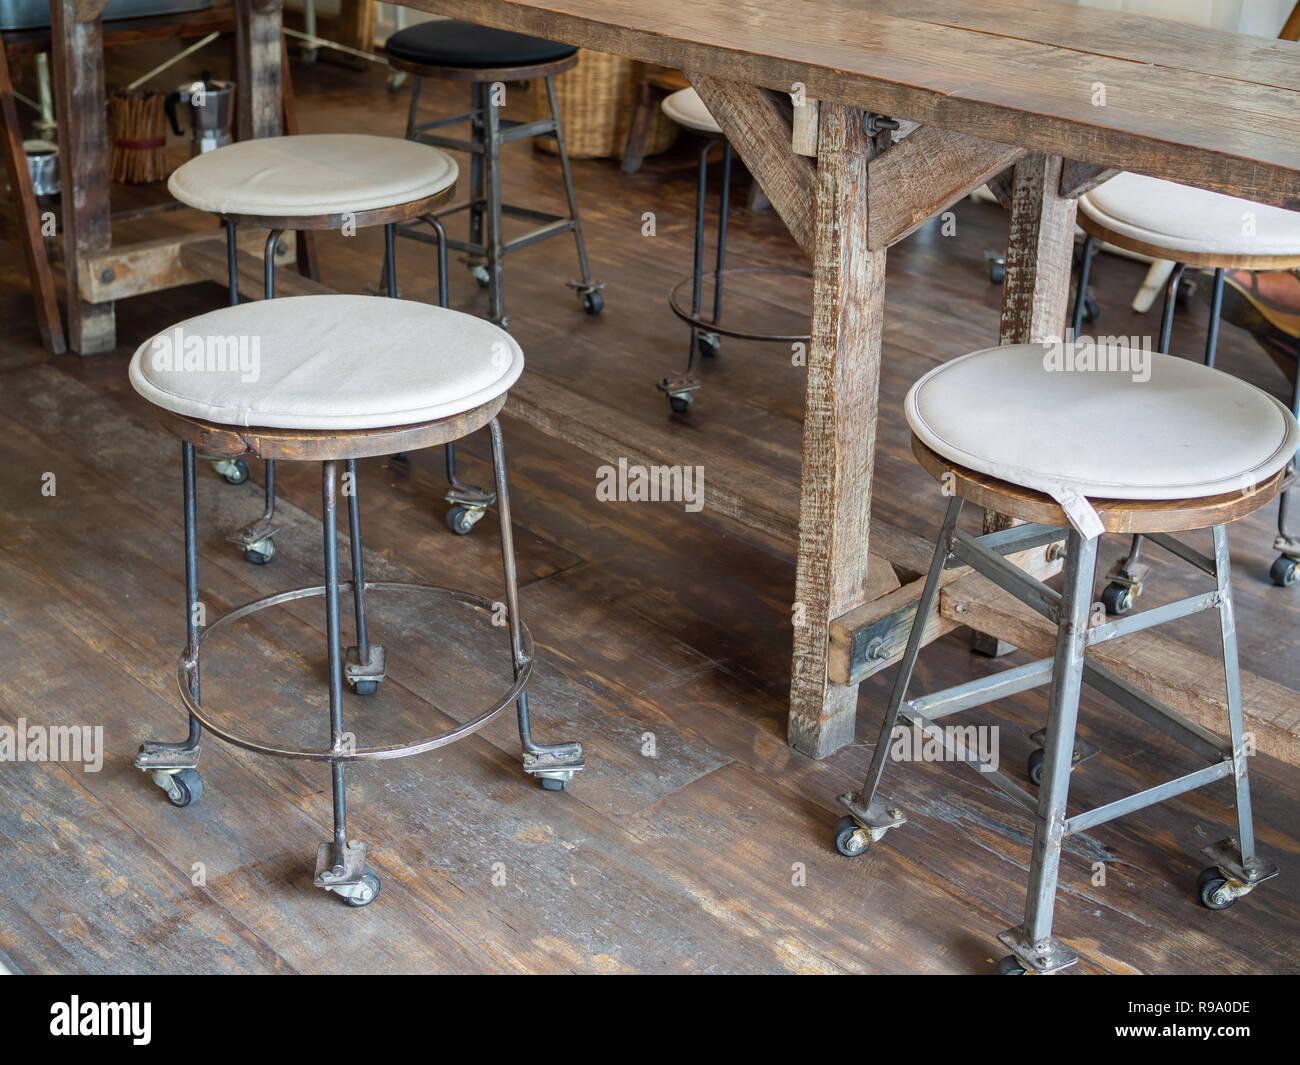 Vintage bar stools immagini vintage bar stools fotos stock alamy